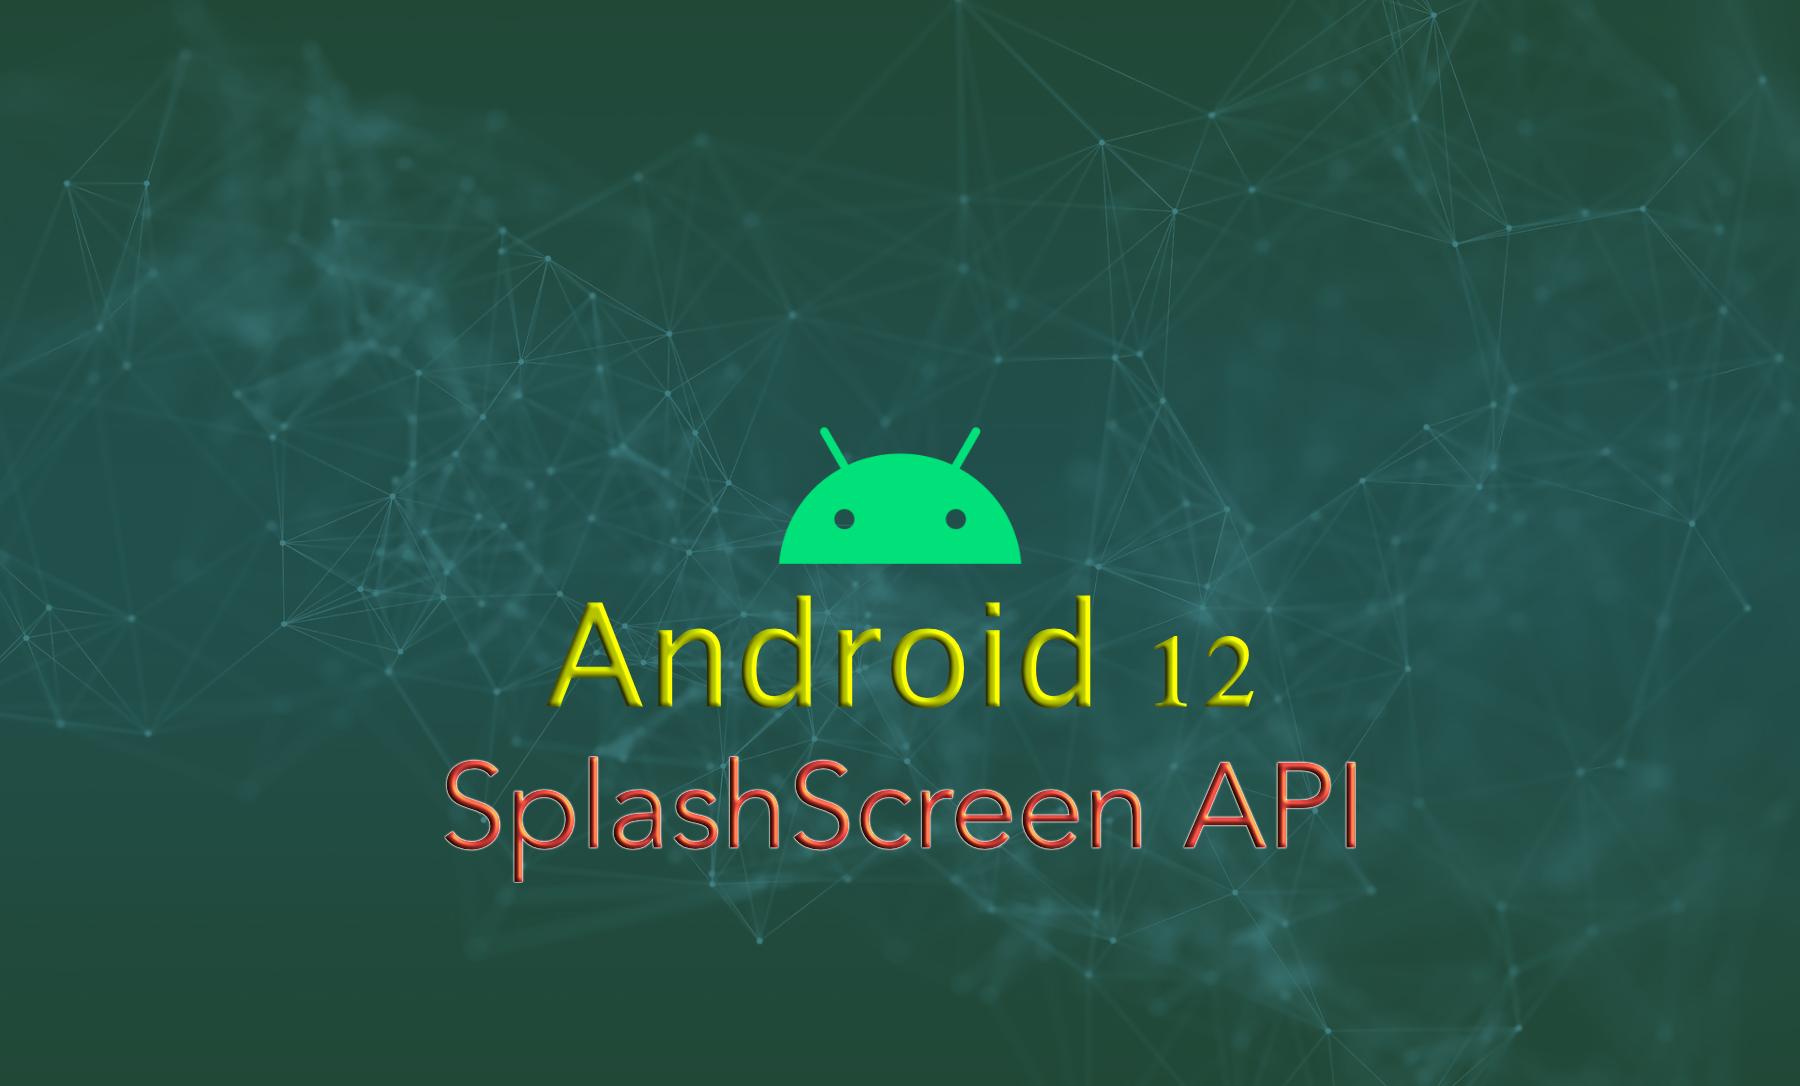 Android 12: Splash Screen API